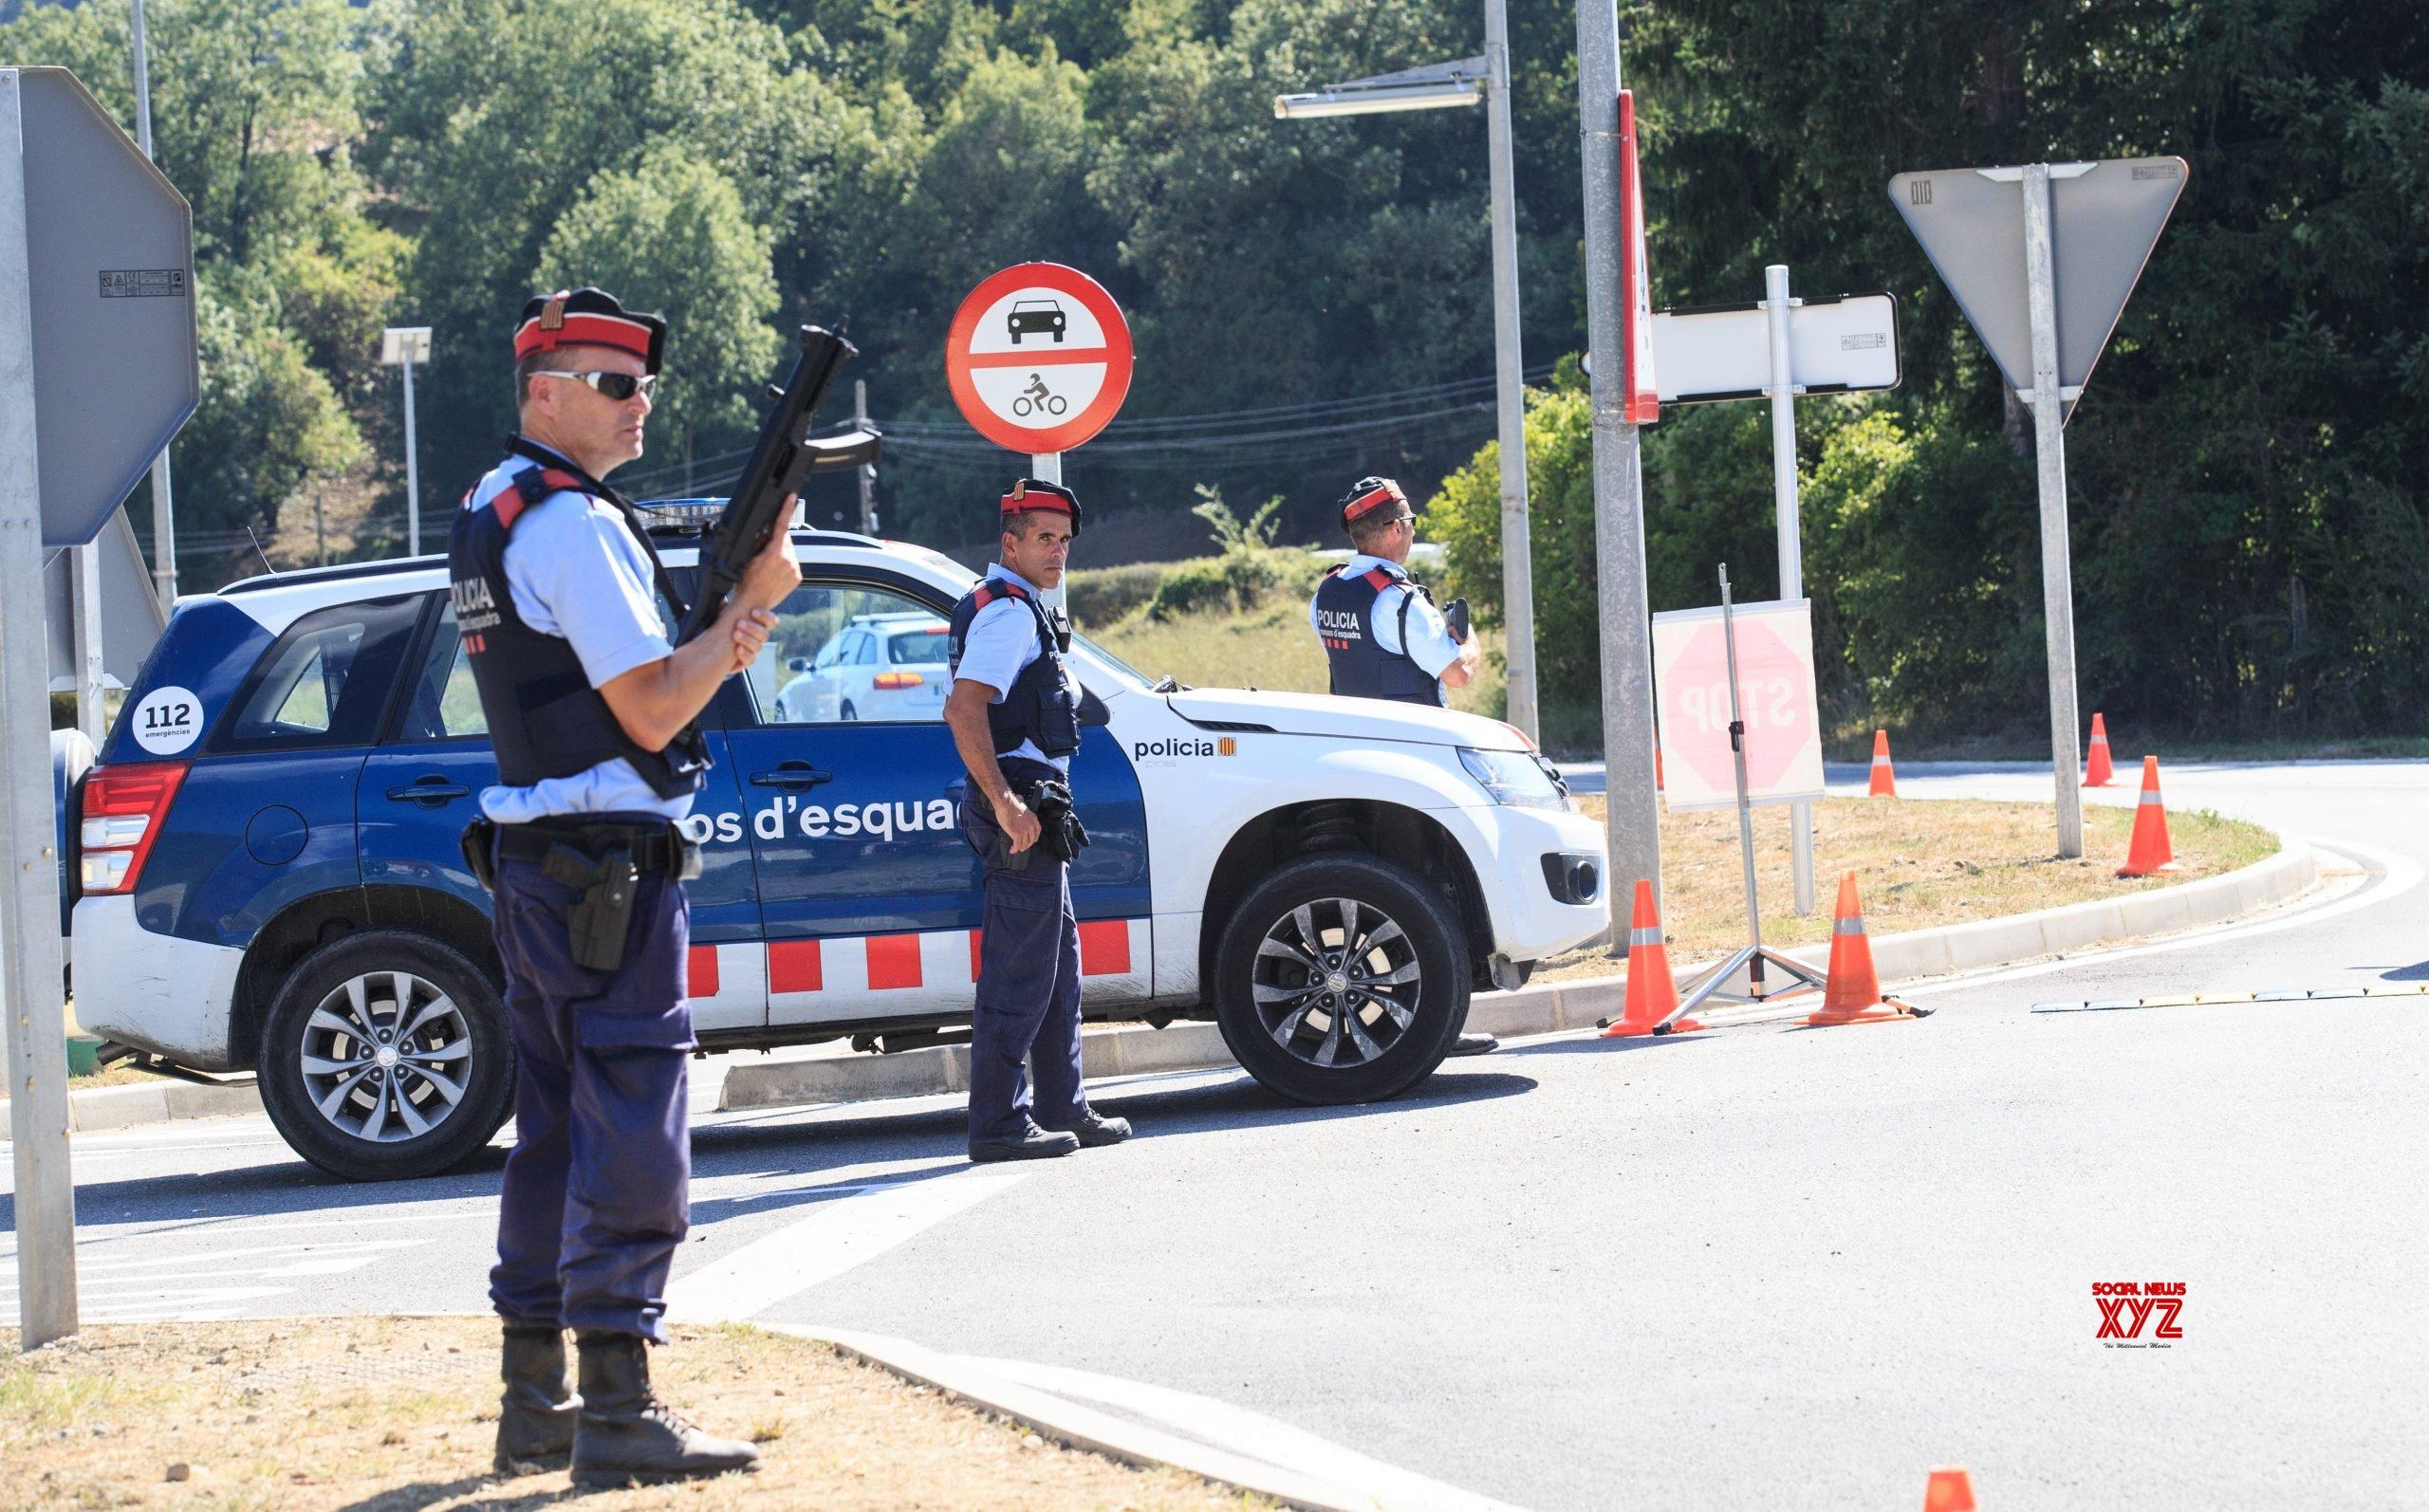 Spanish police detain 4 suspected jihadis